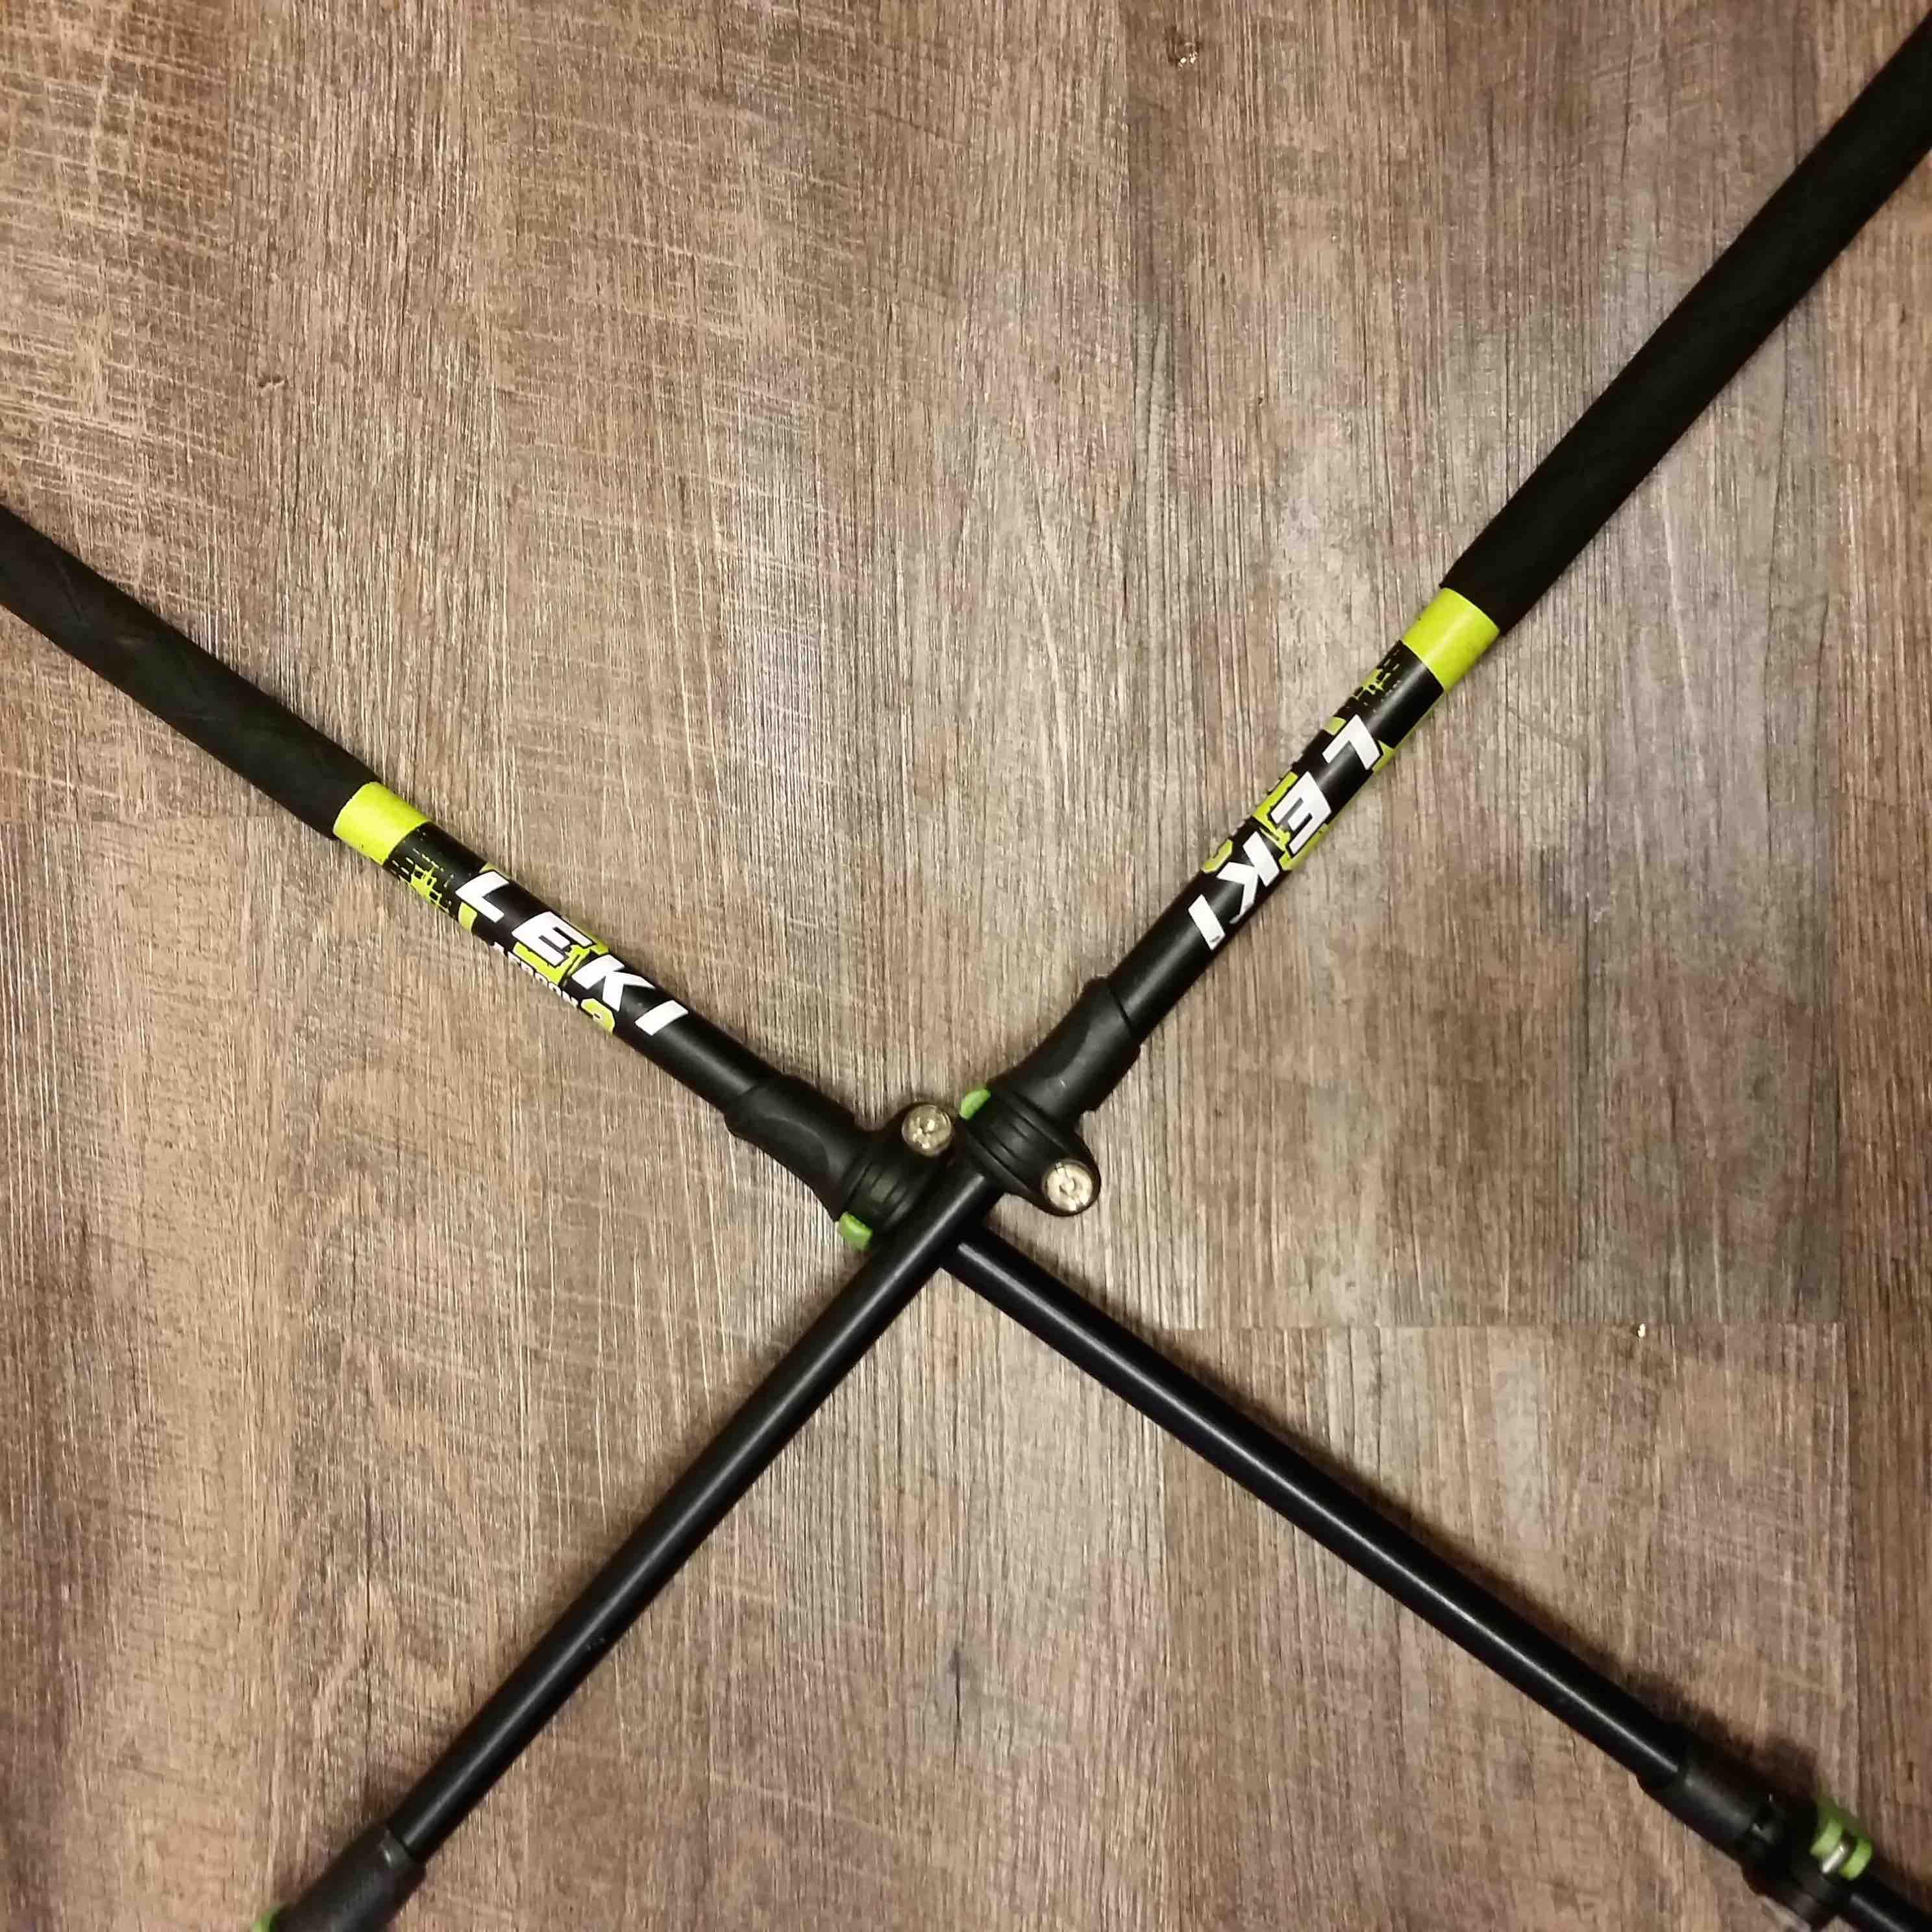 Leki Aergon 3 Ski Pole